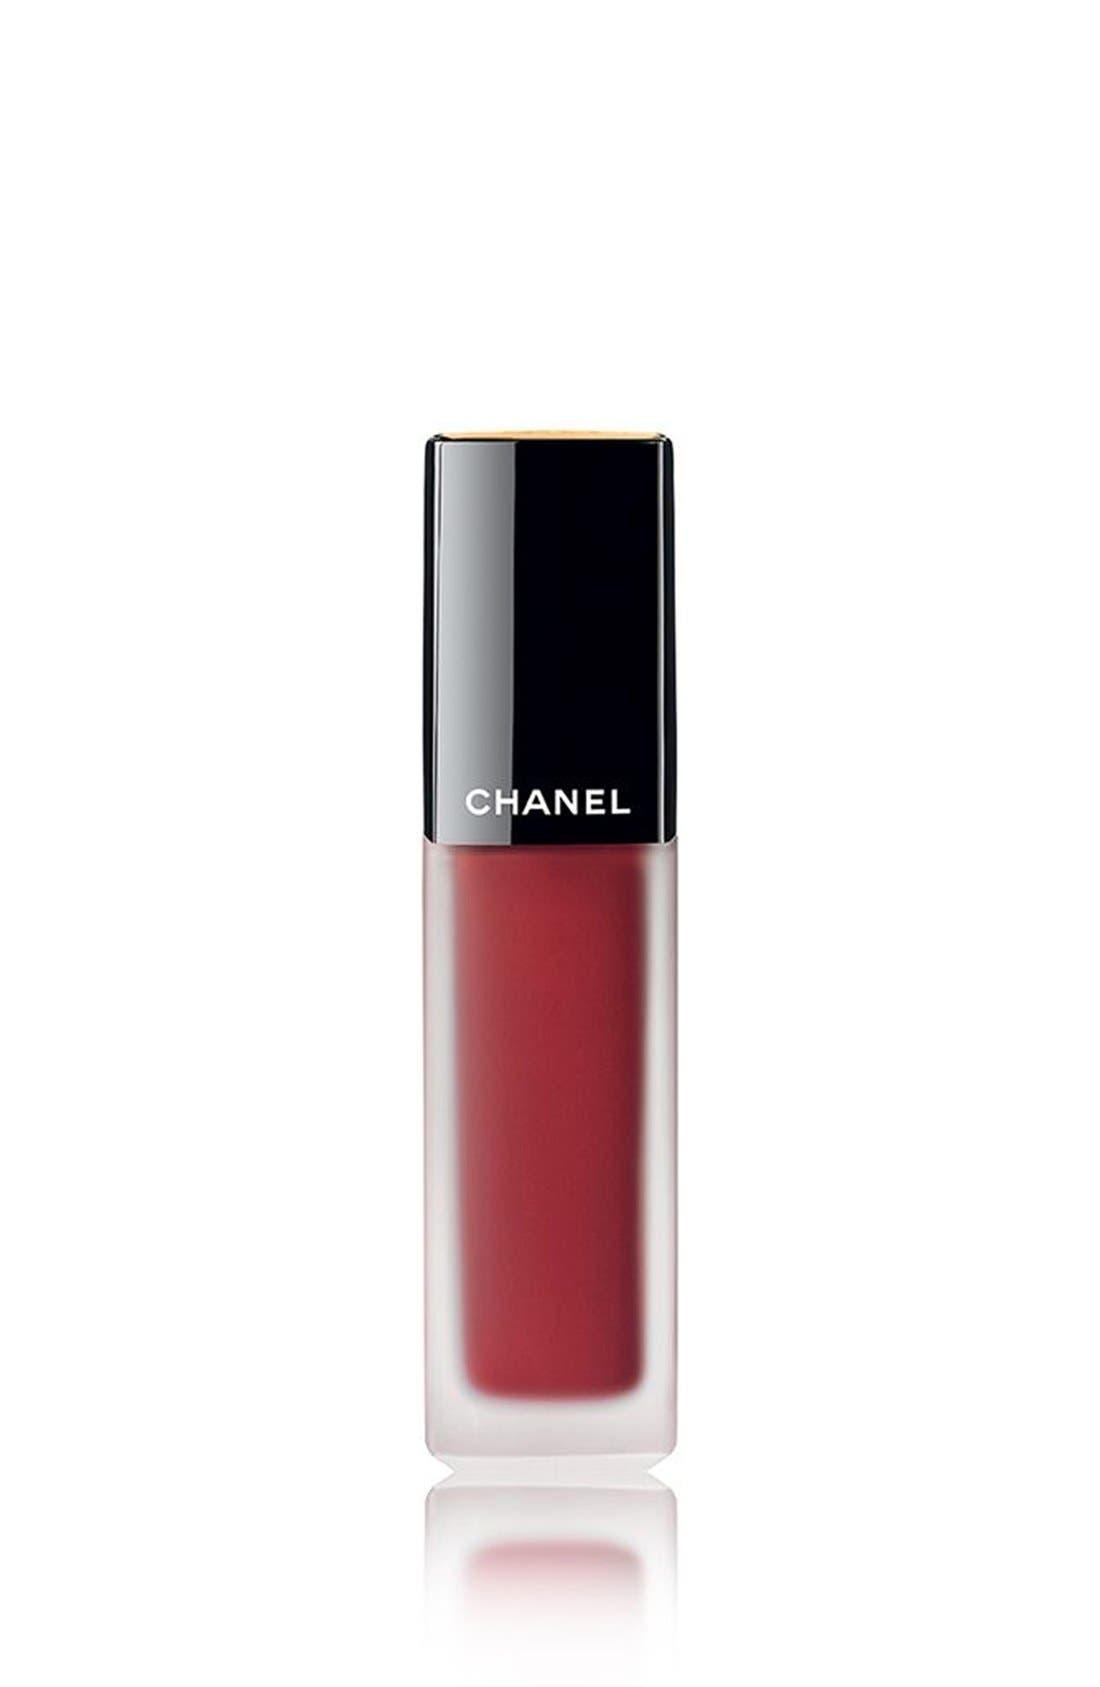 CHANEL Lipstick, Lip Gloss, u0026 More  Nordstrom